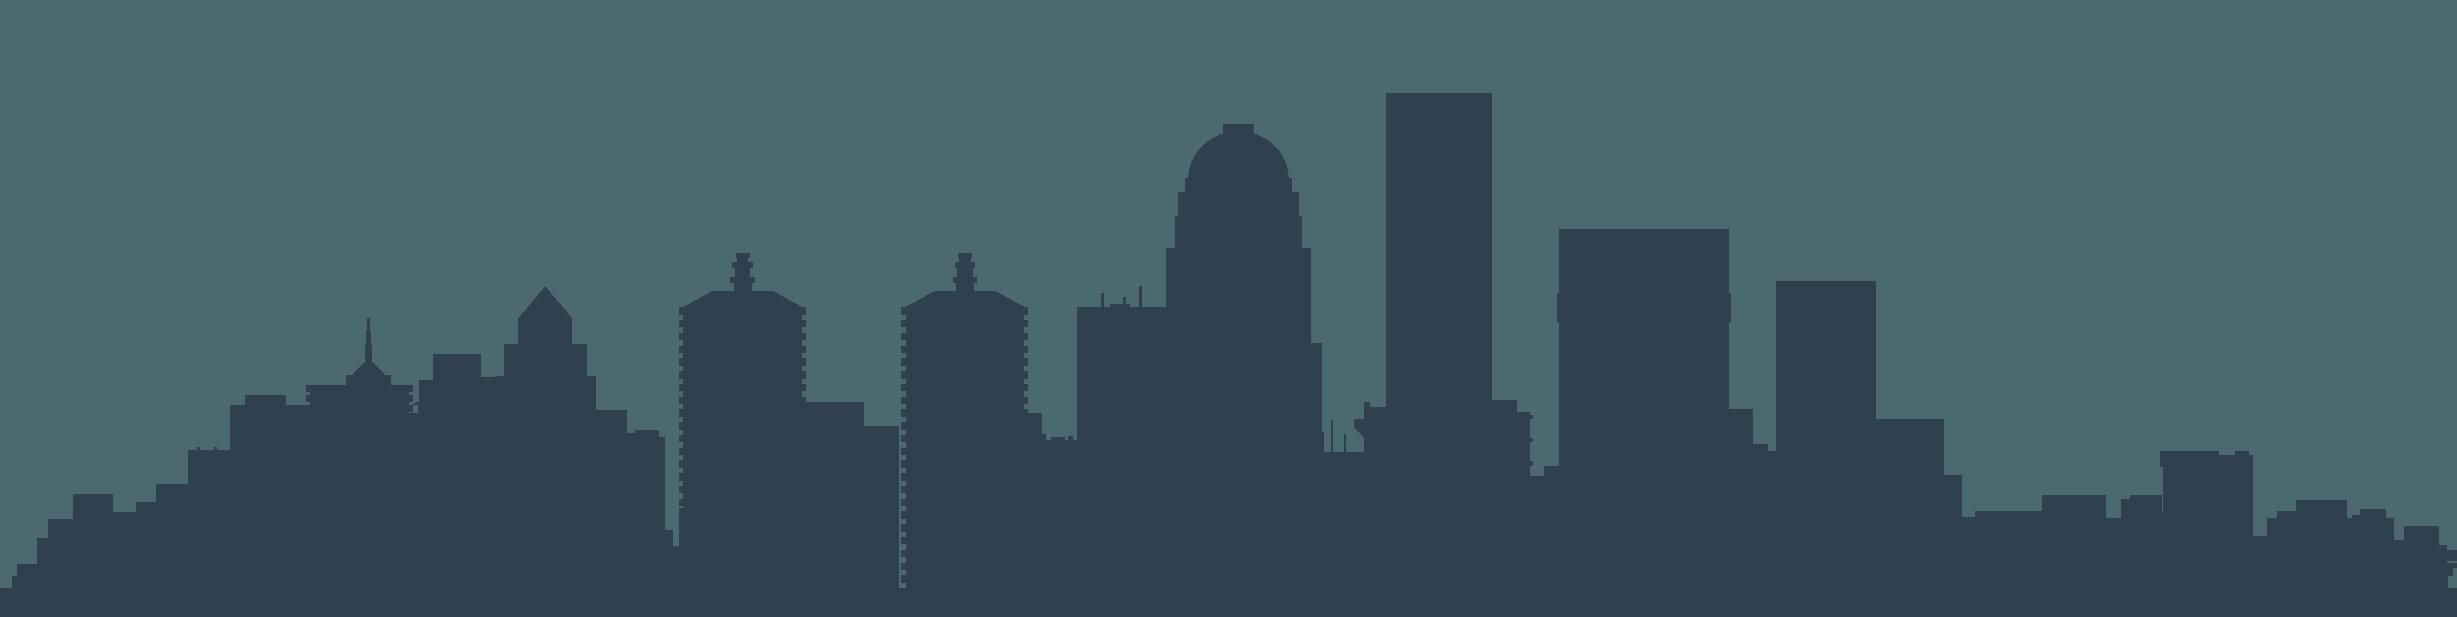 Louisville Bluebird Homecare Skyline.